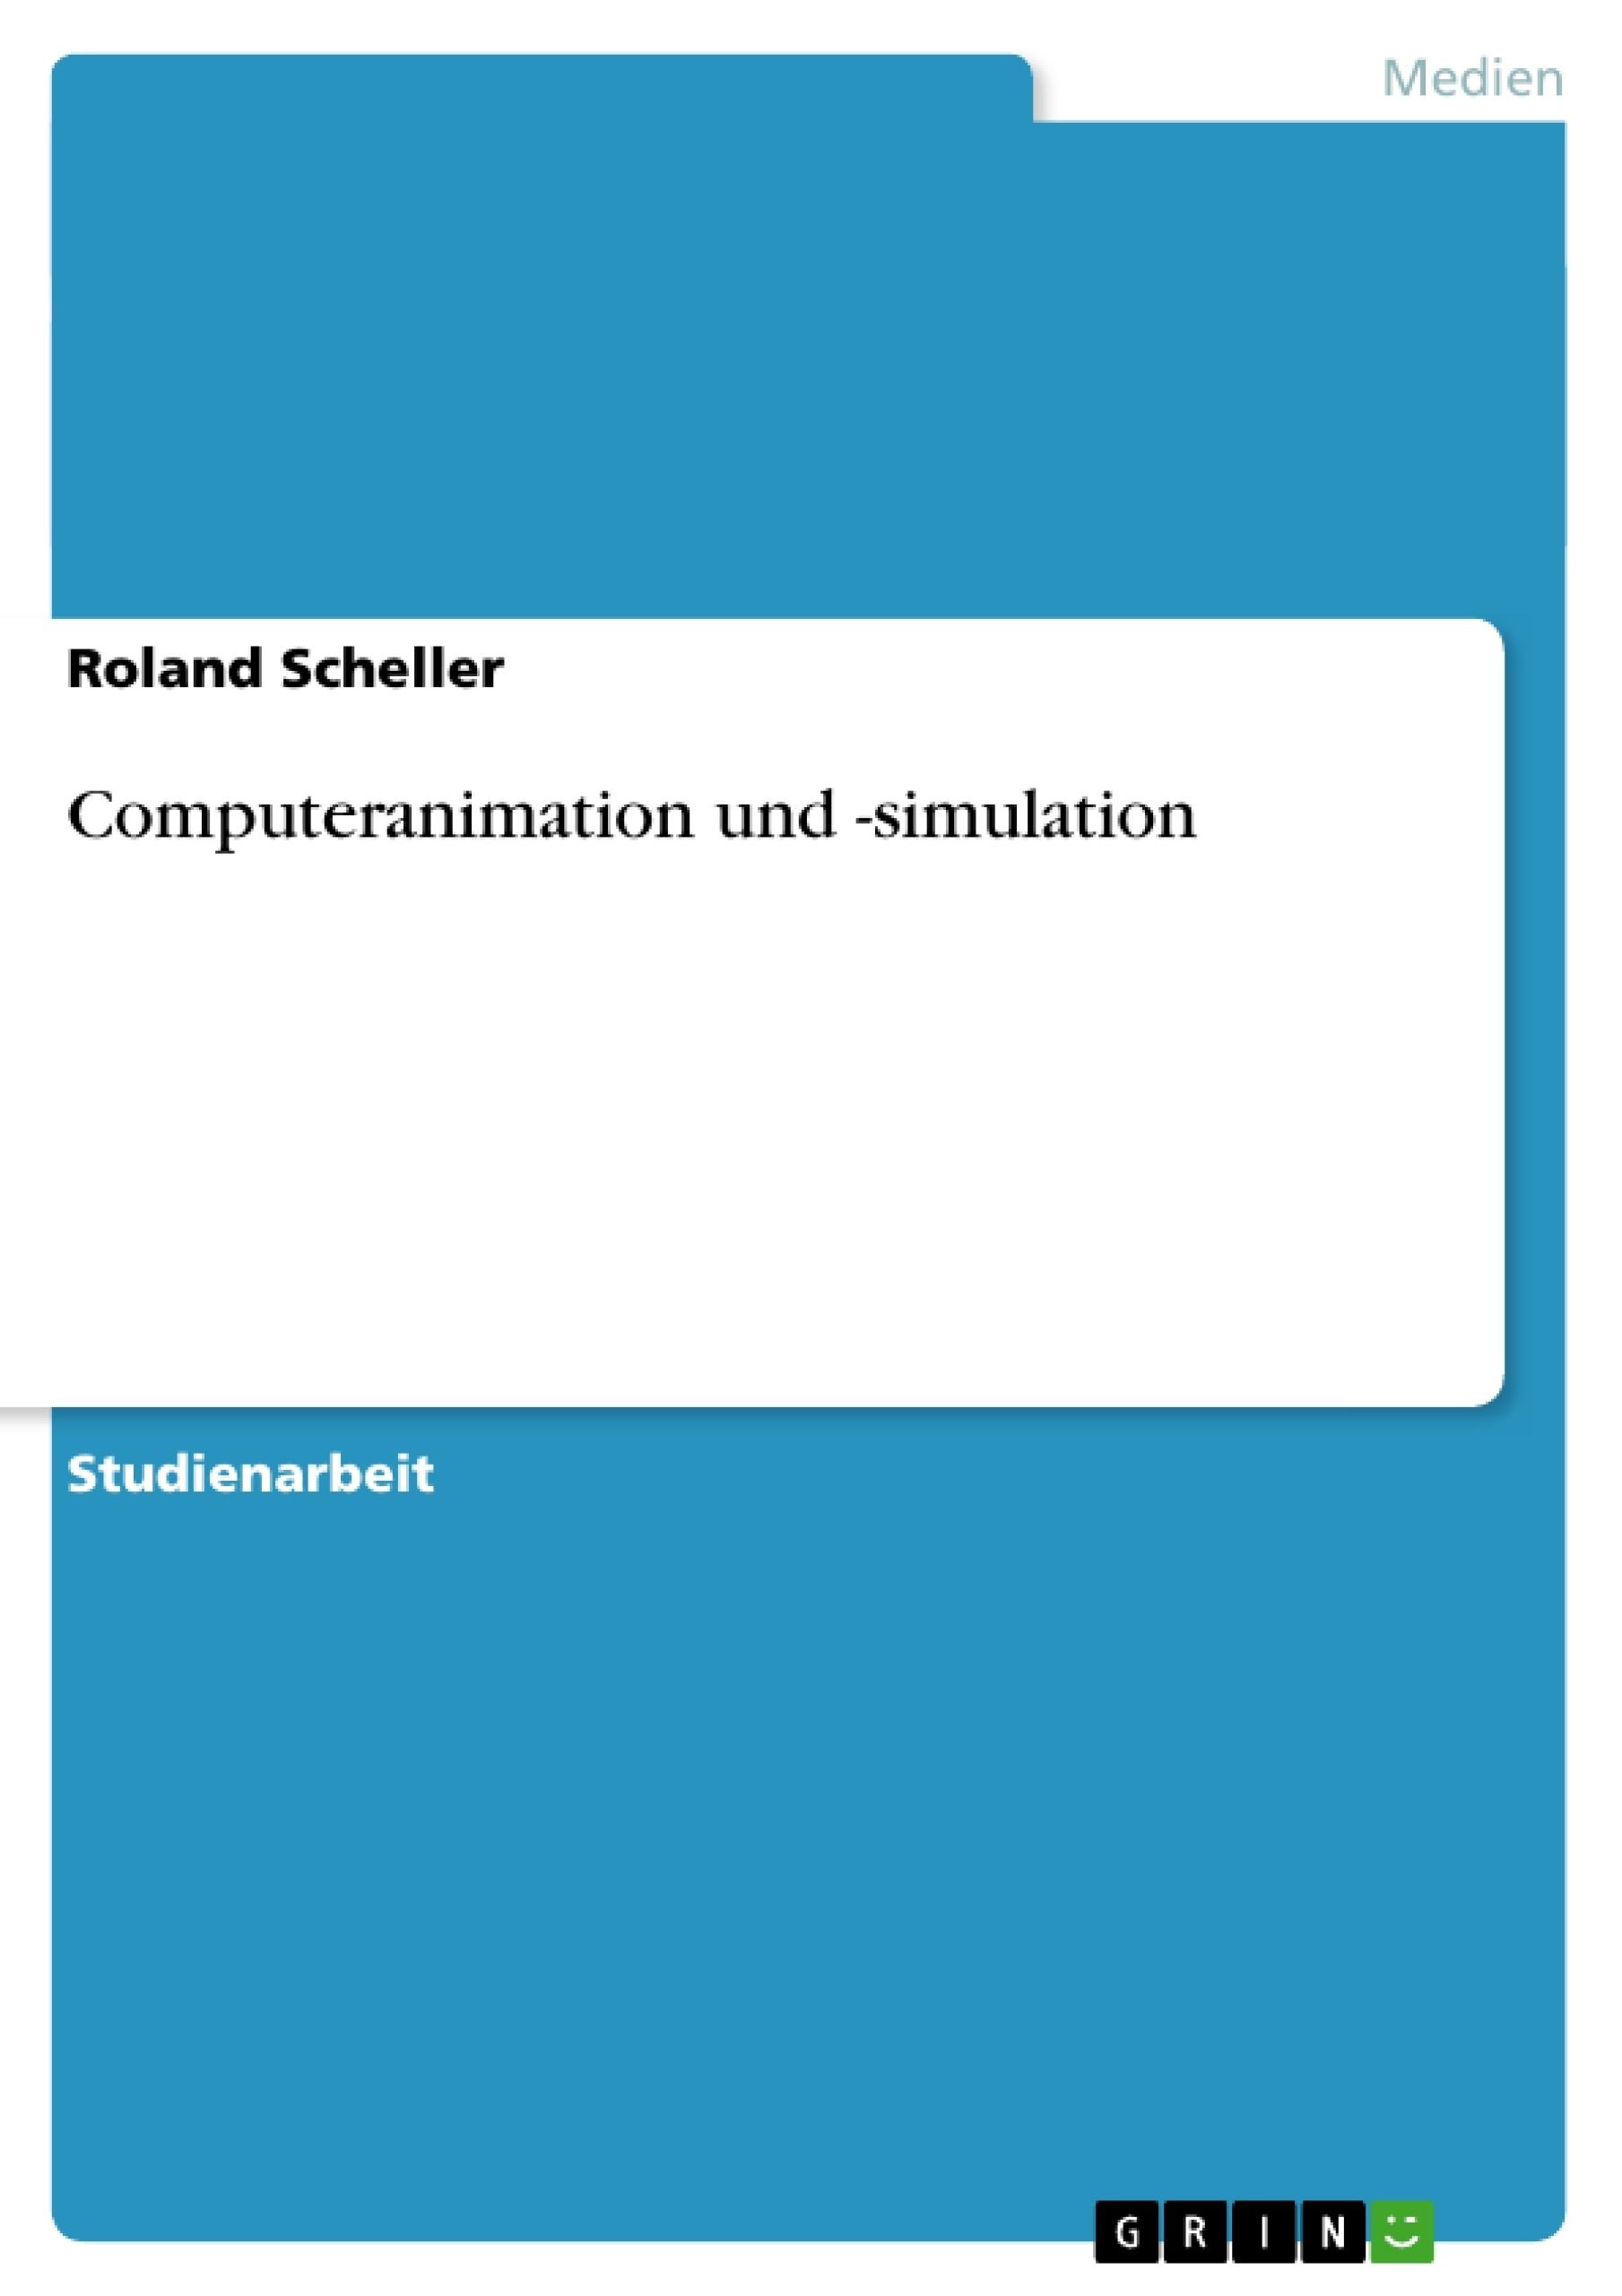 Titel: Computeranimation und -simulation